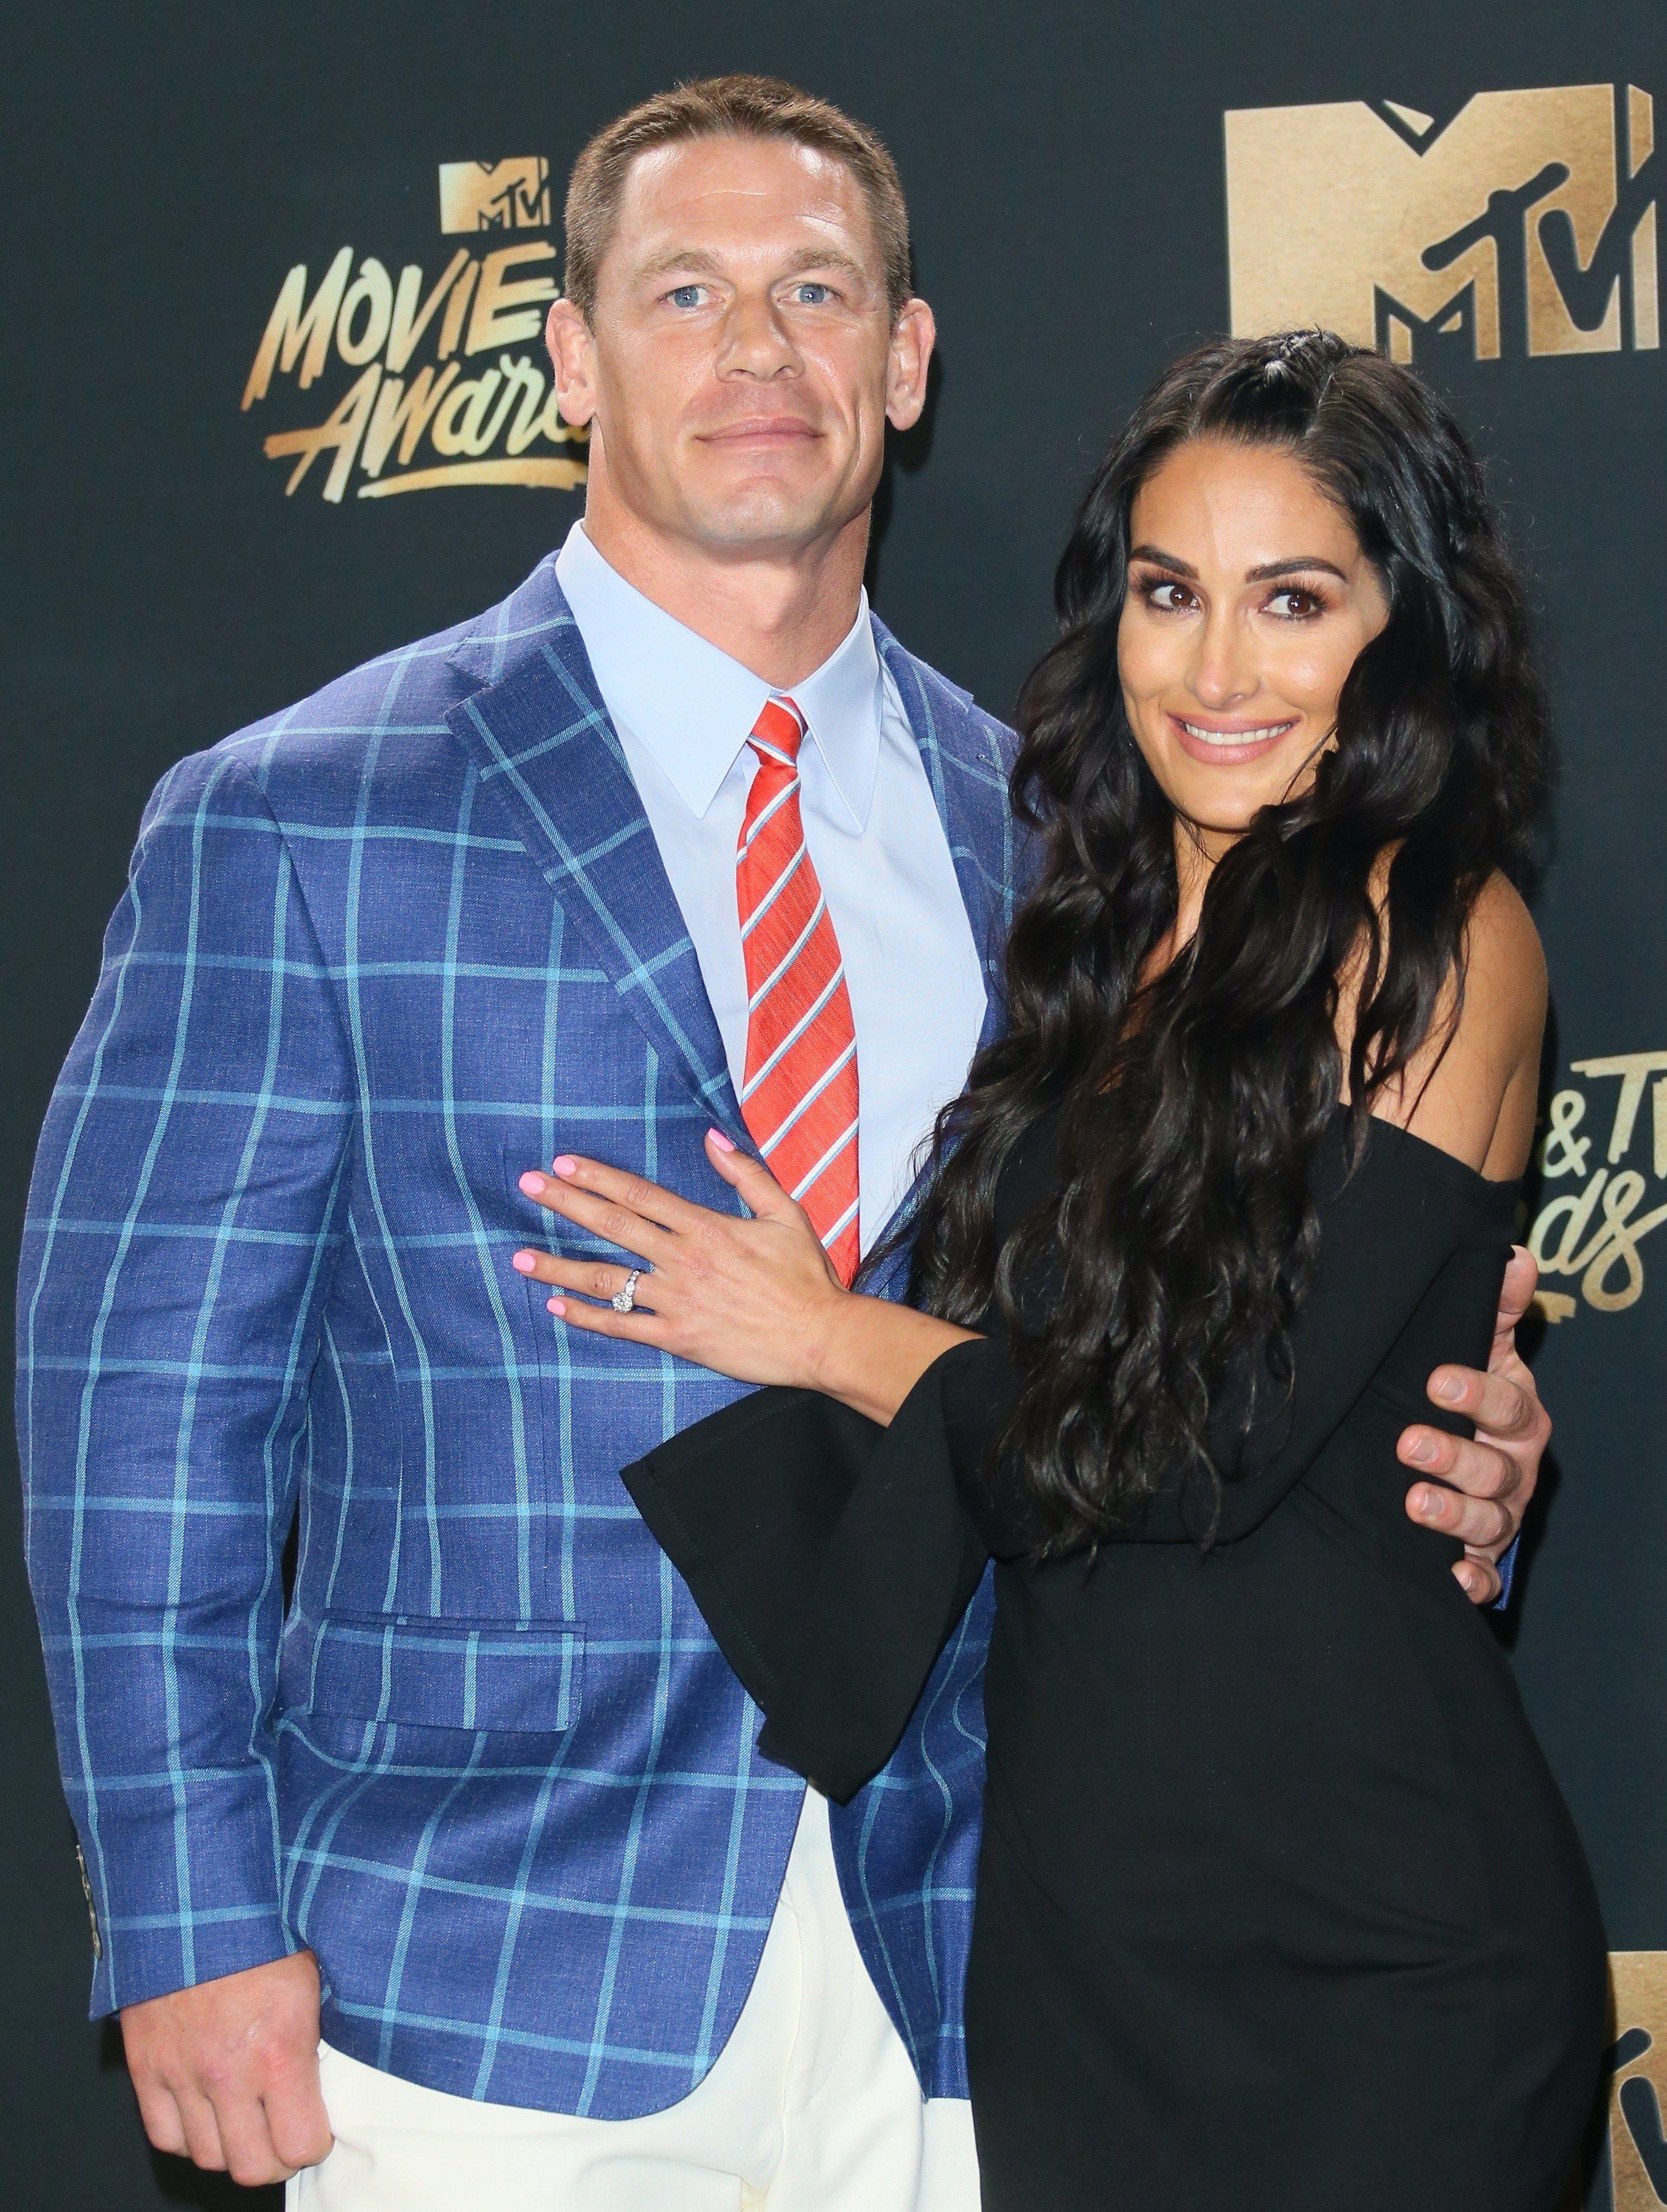 Nikki Bella And John Cena Wedding.Nikki Bella Reveals She Wants A Black Tie Wedding Wwe Couples